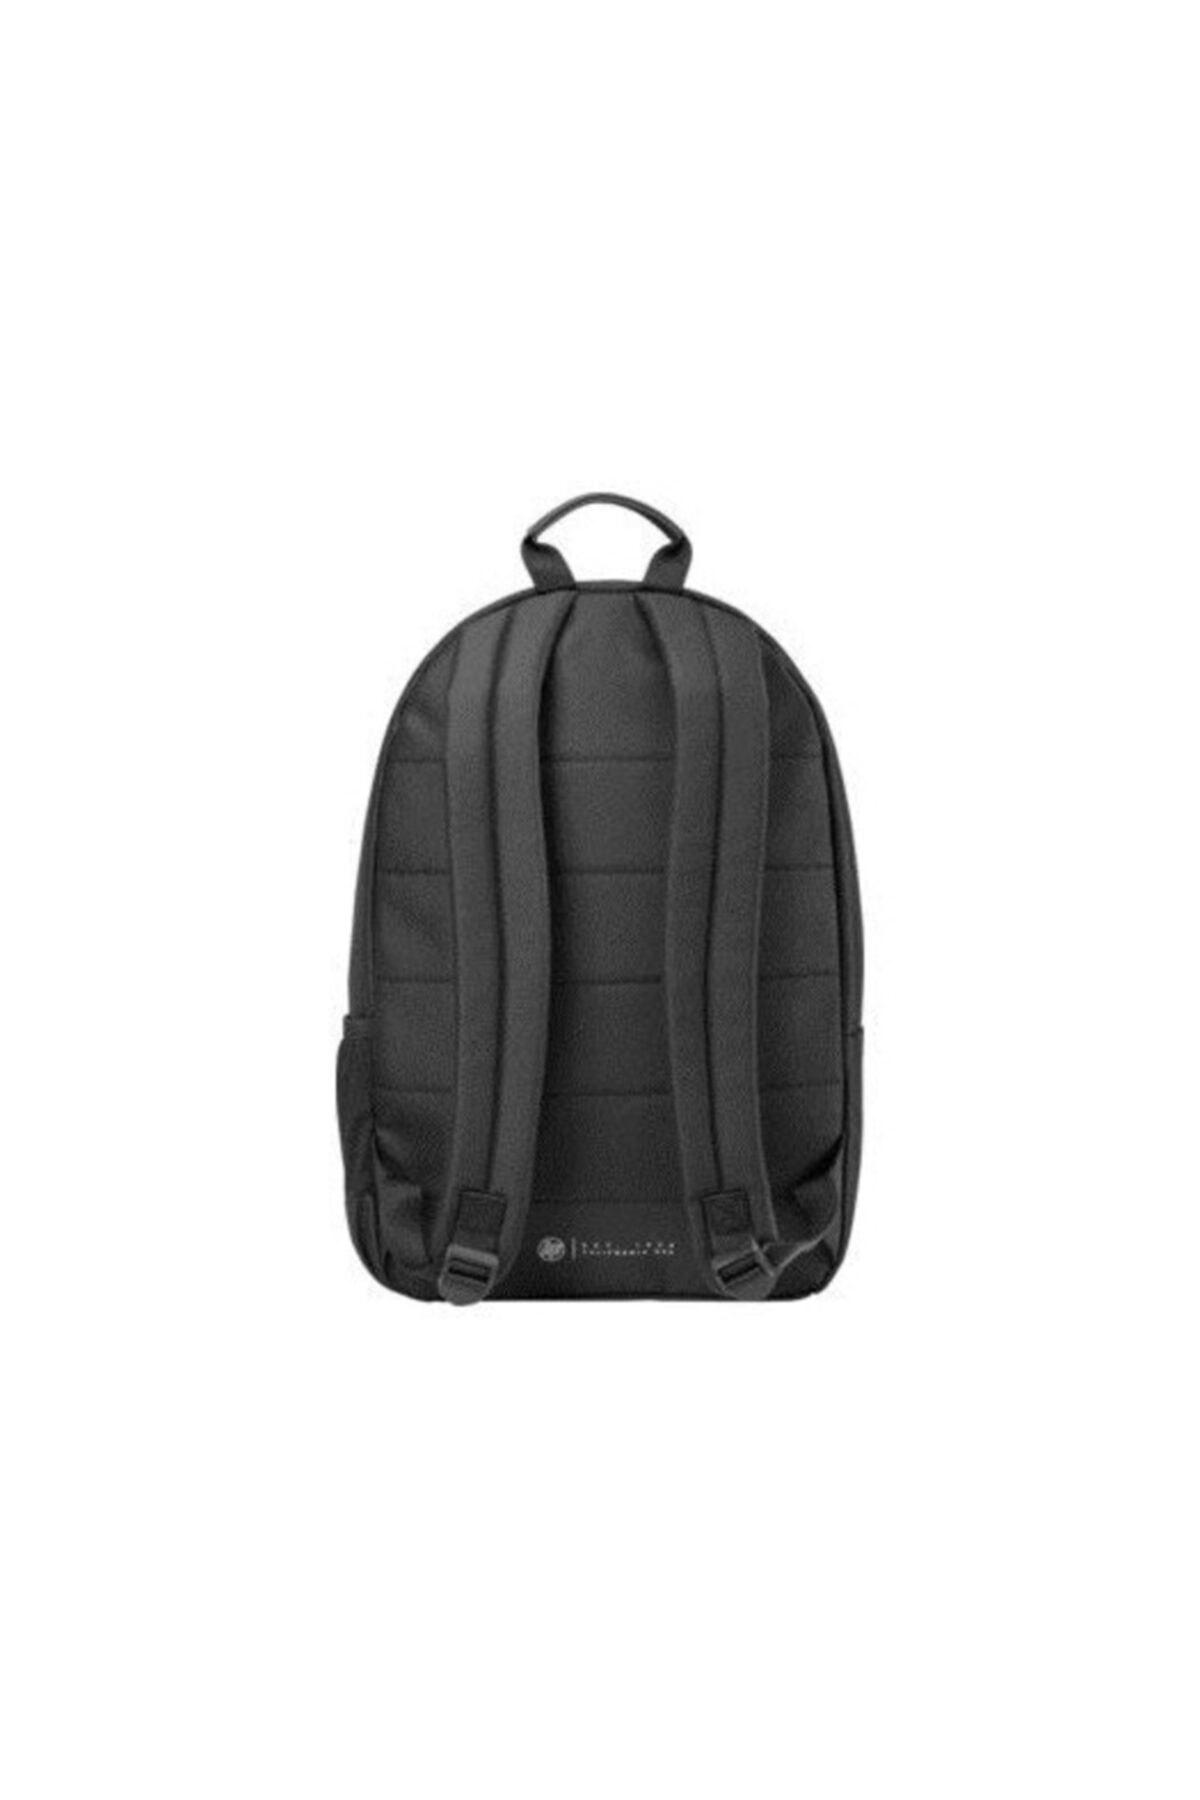 "HP Classic 15.6"" Siyah Notebook Sırt Çantası 1fk05aa 2"